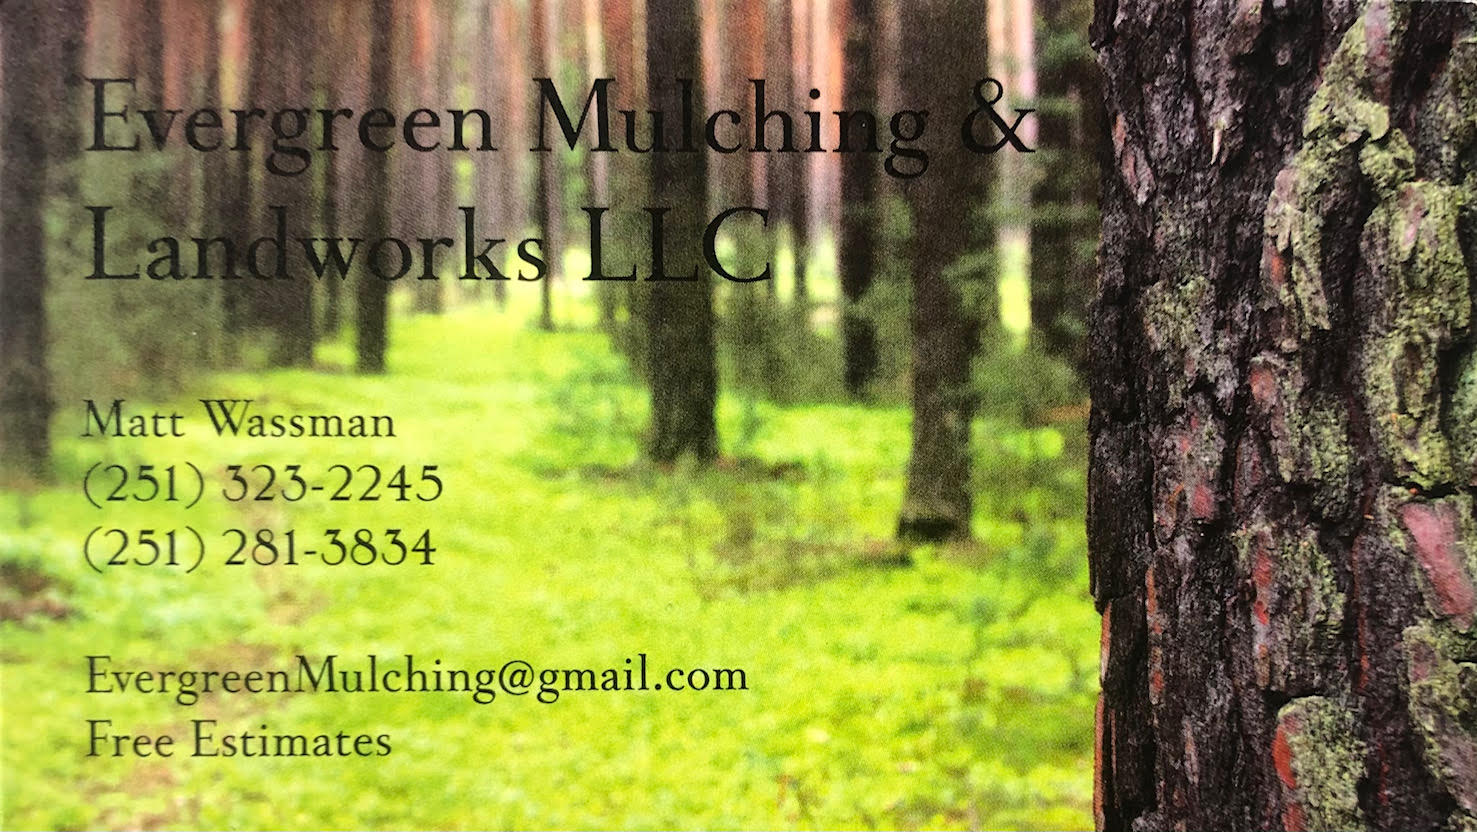 Evergreen Mulching & Landworks LLC